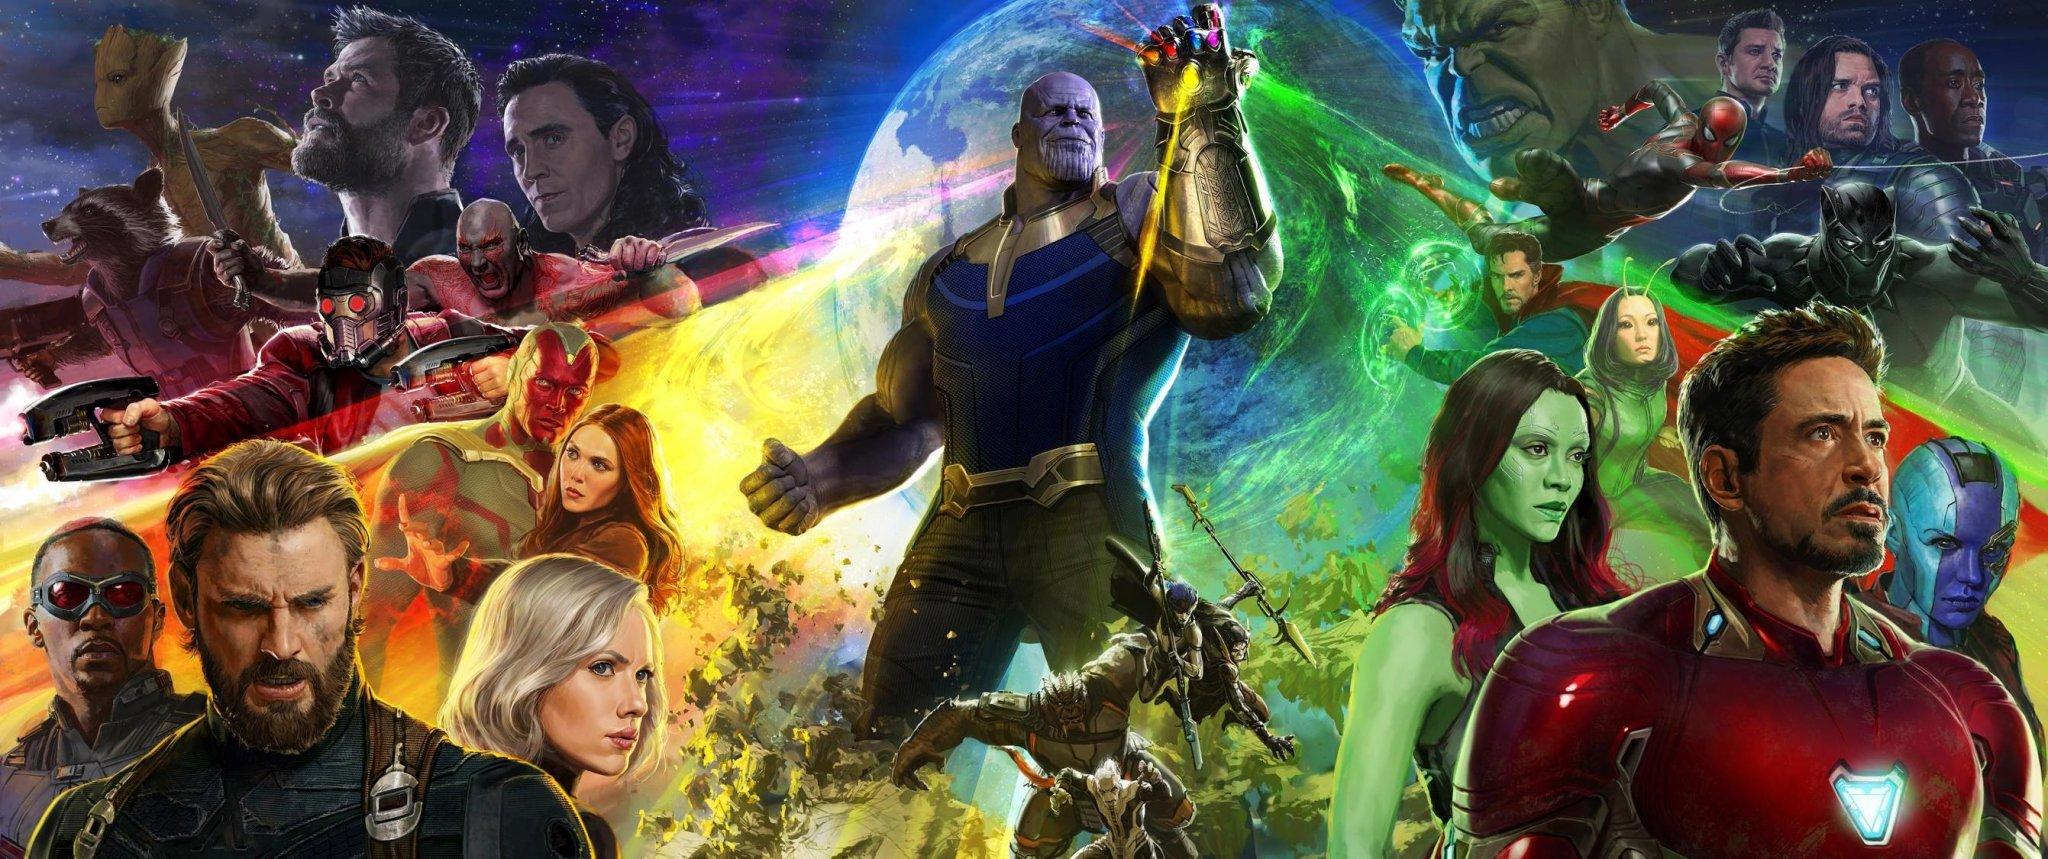 Avengers Infinity War Summary